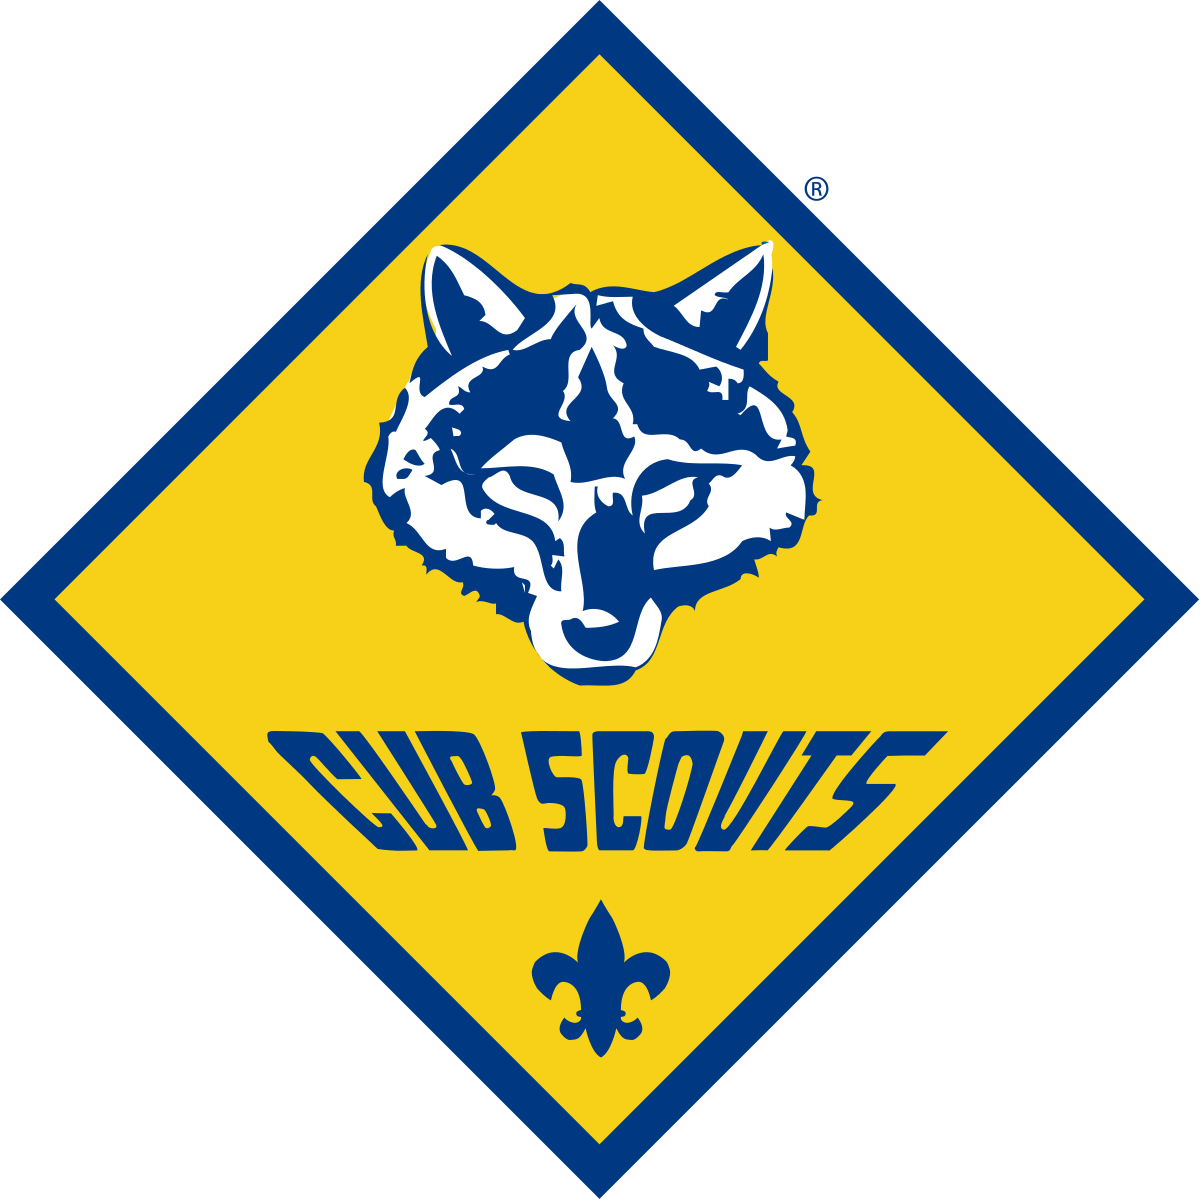 1200x1200 Cub Scouting (Boy Scouts Of America)